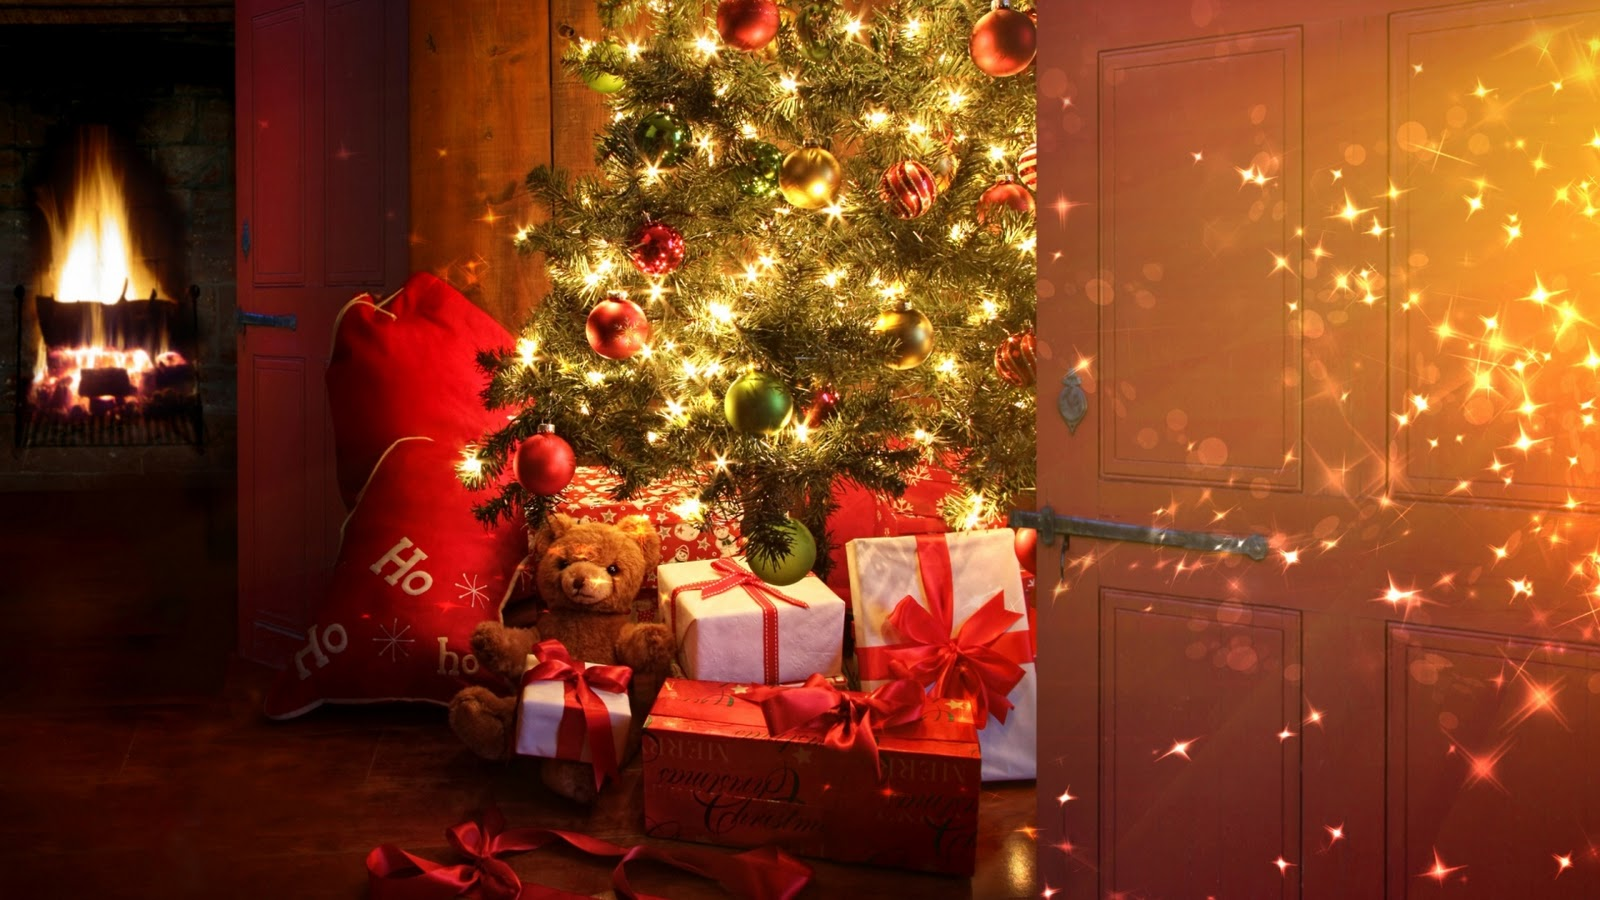 http://4.bp.blogspot.com/-Eri_p903pgk/TvbWUxJ7vyI/AAAAAAAABrg/Wz2rdr1G_Wk/s1600/christmas-tree3.jpg